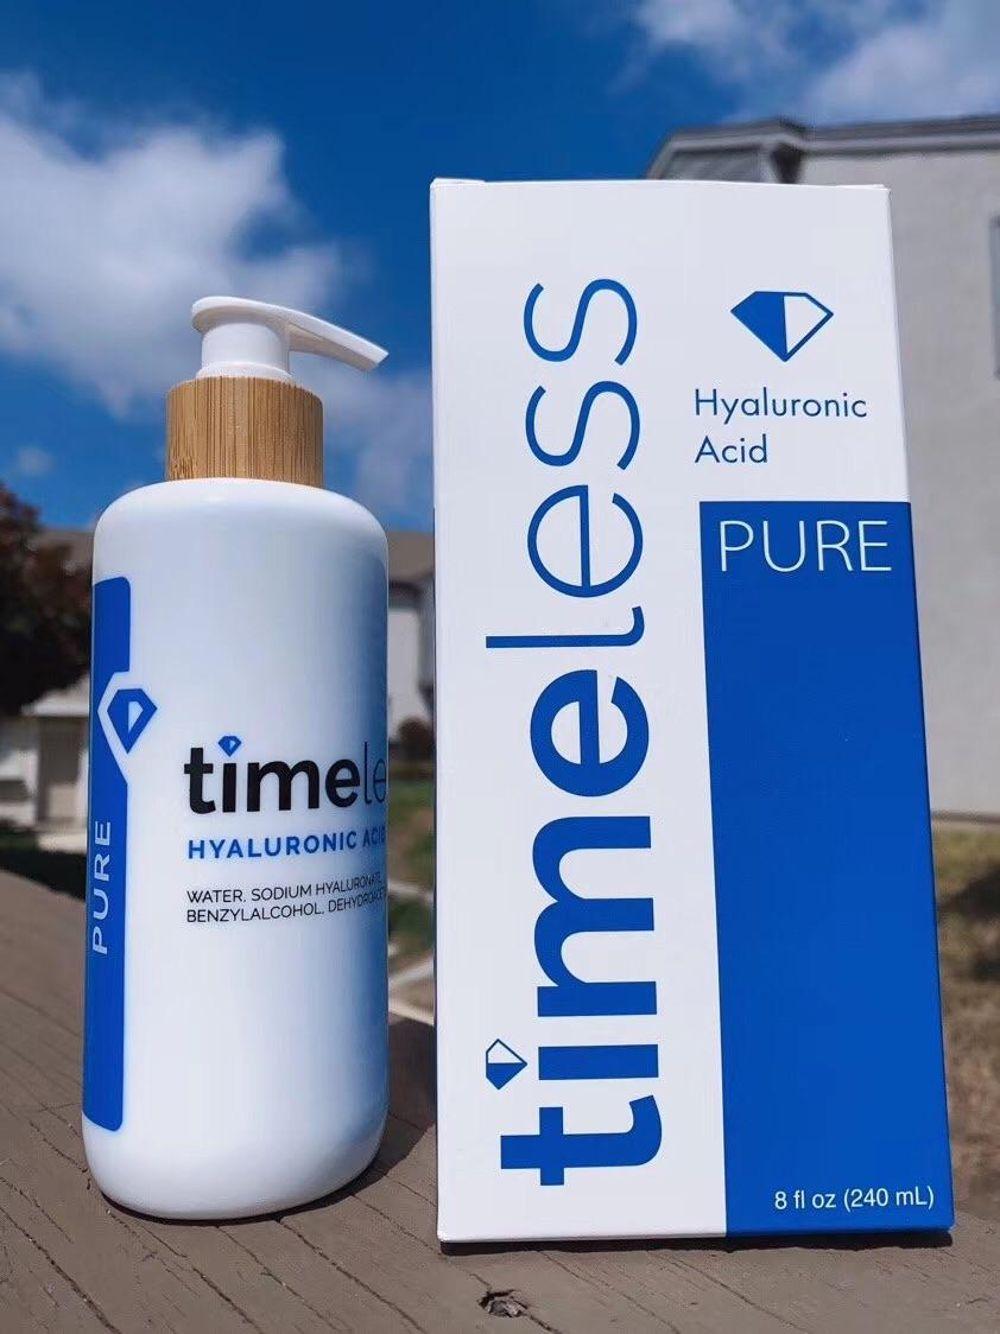 Timeless/HA高浓度玻尿酸精华原液高保湿补水240ml